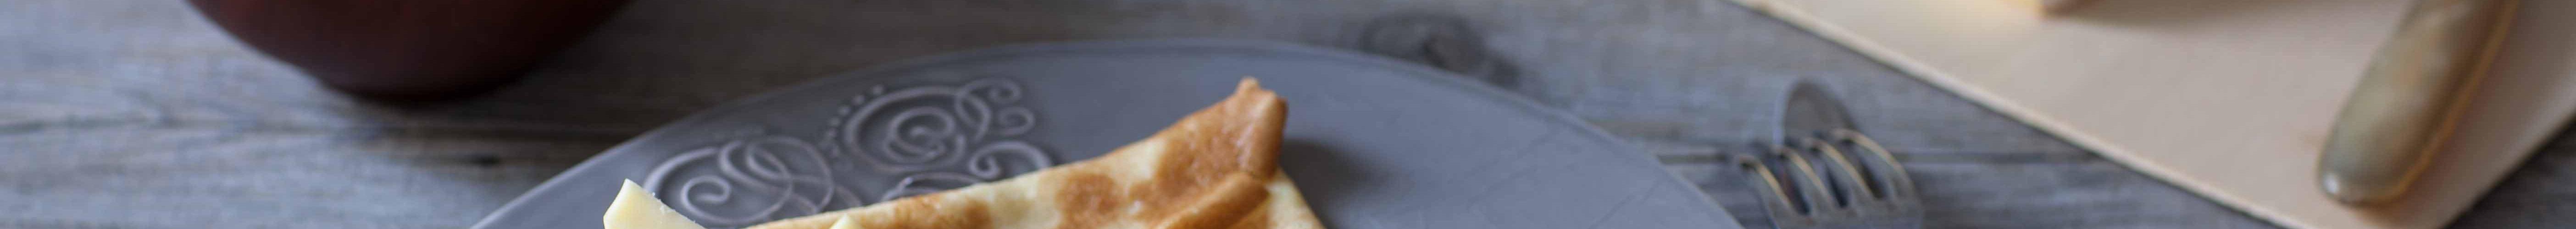 crepe morbier saucisse epniards